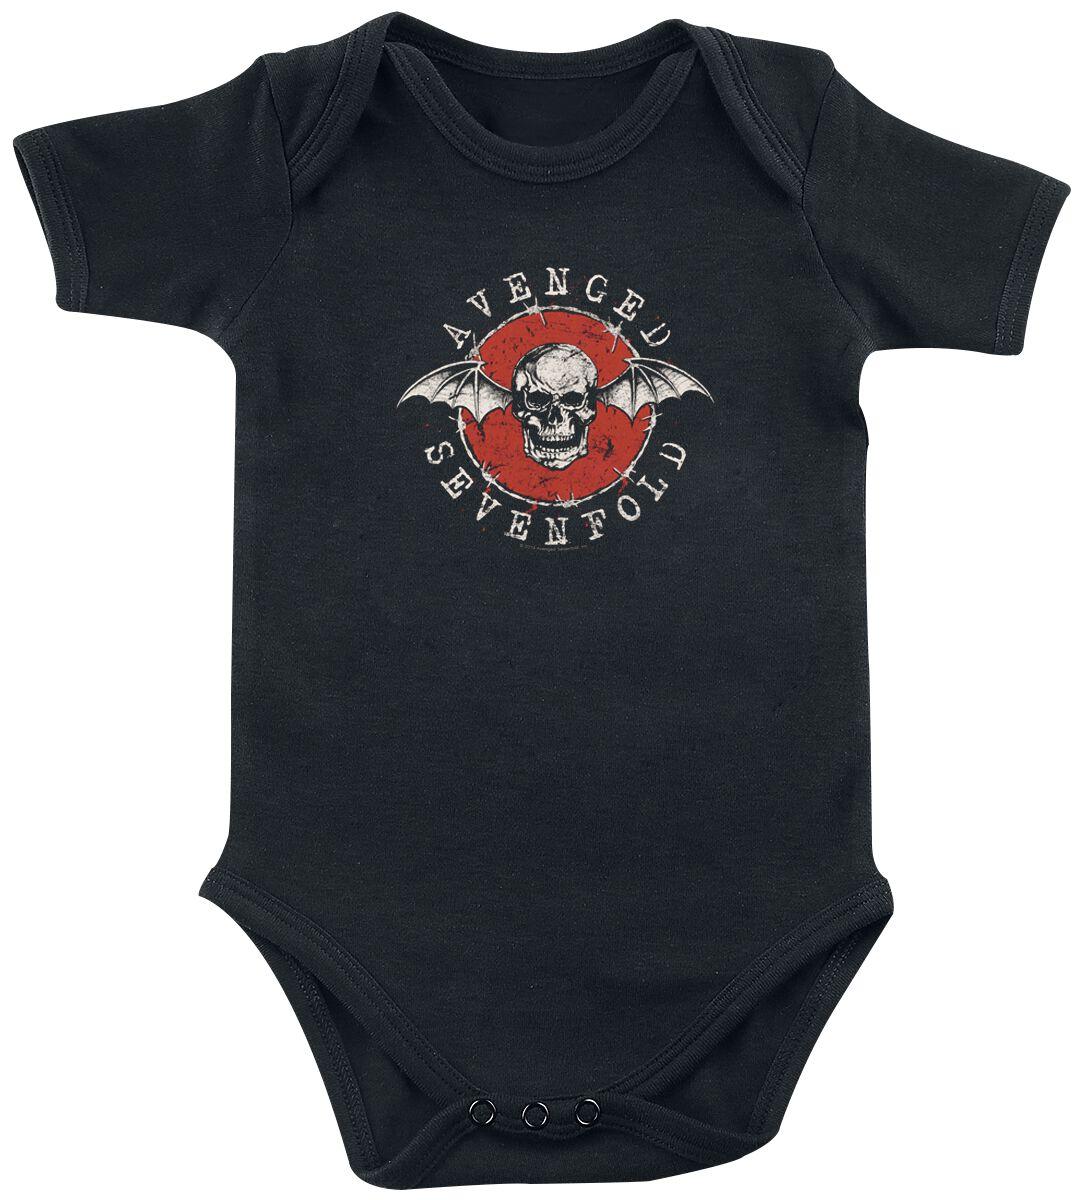 Image of Avenged Sevenfold New Deathbat Body schwarz